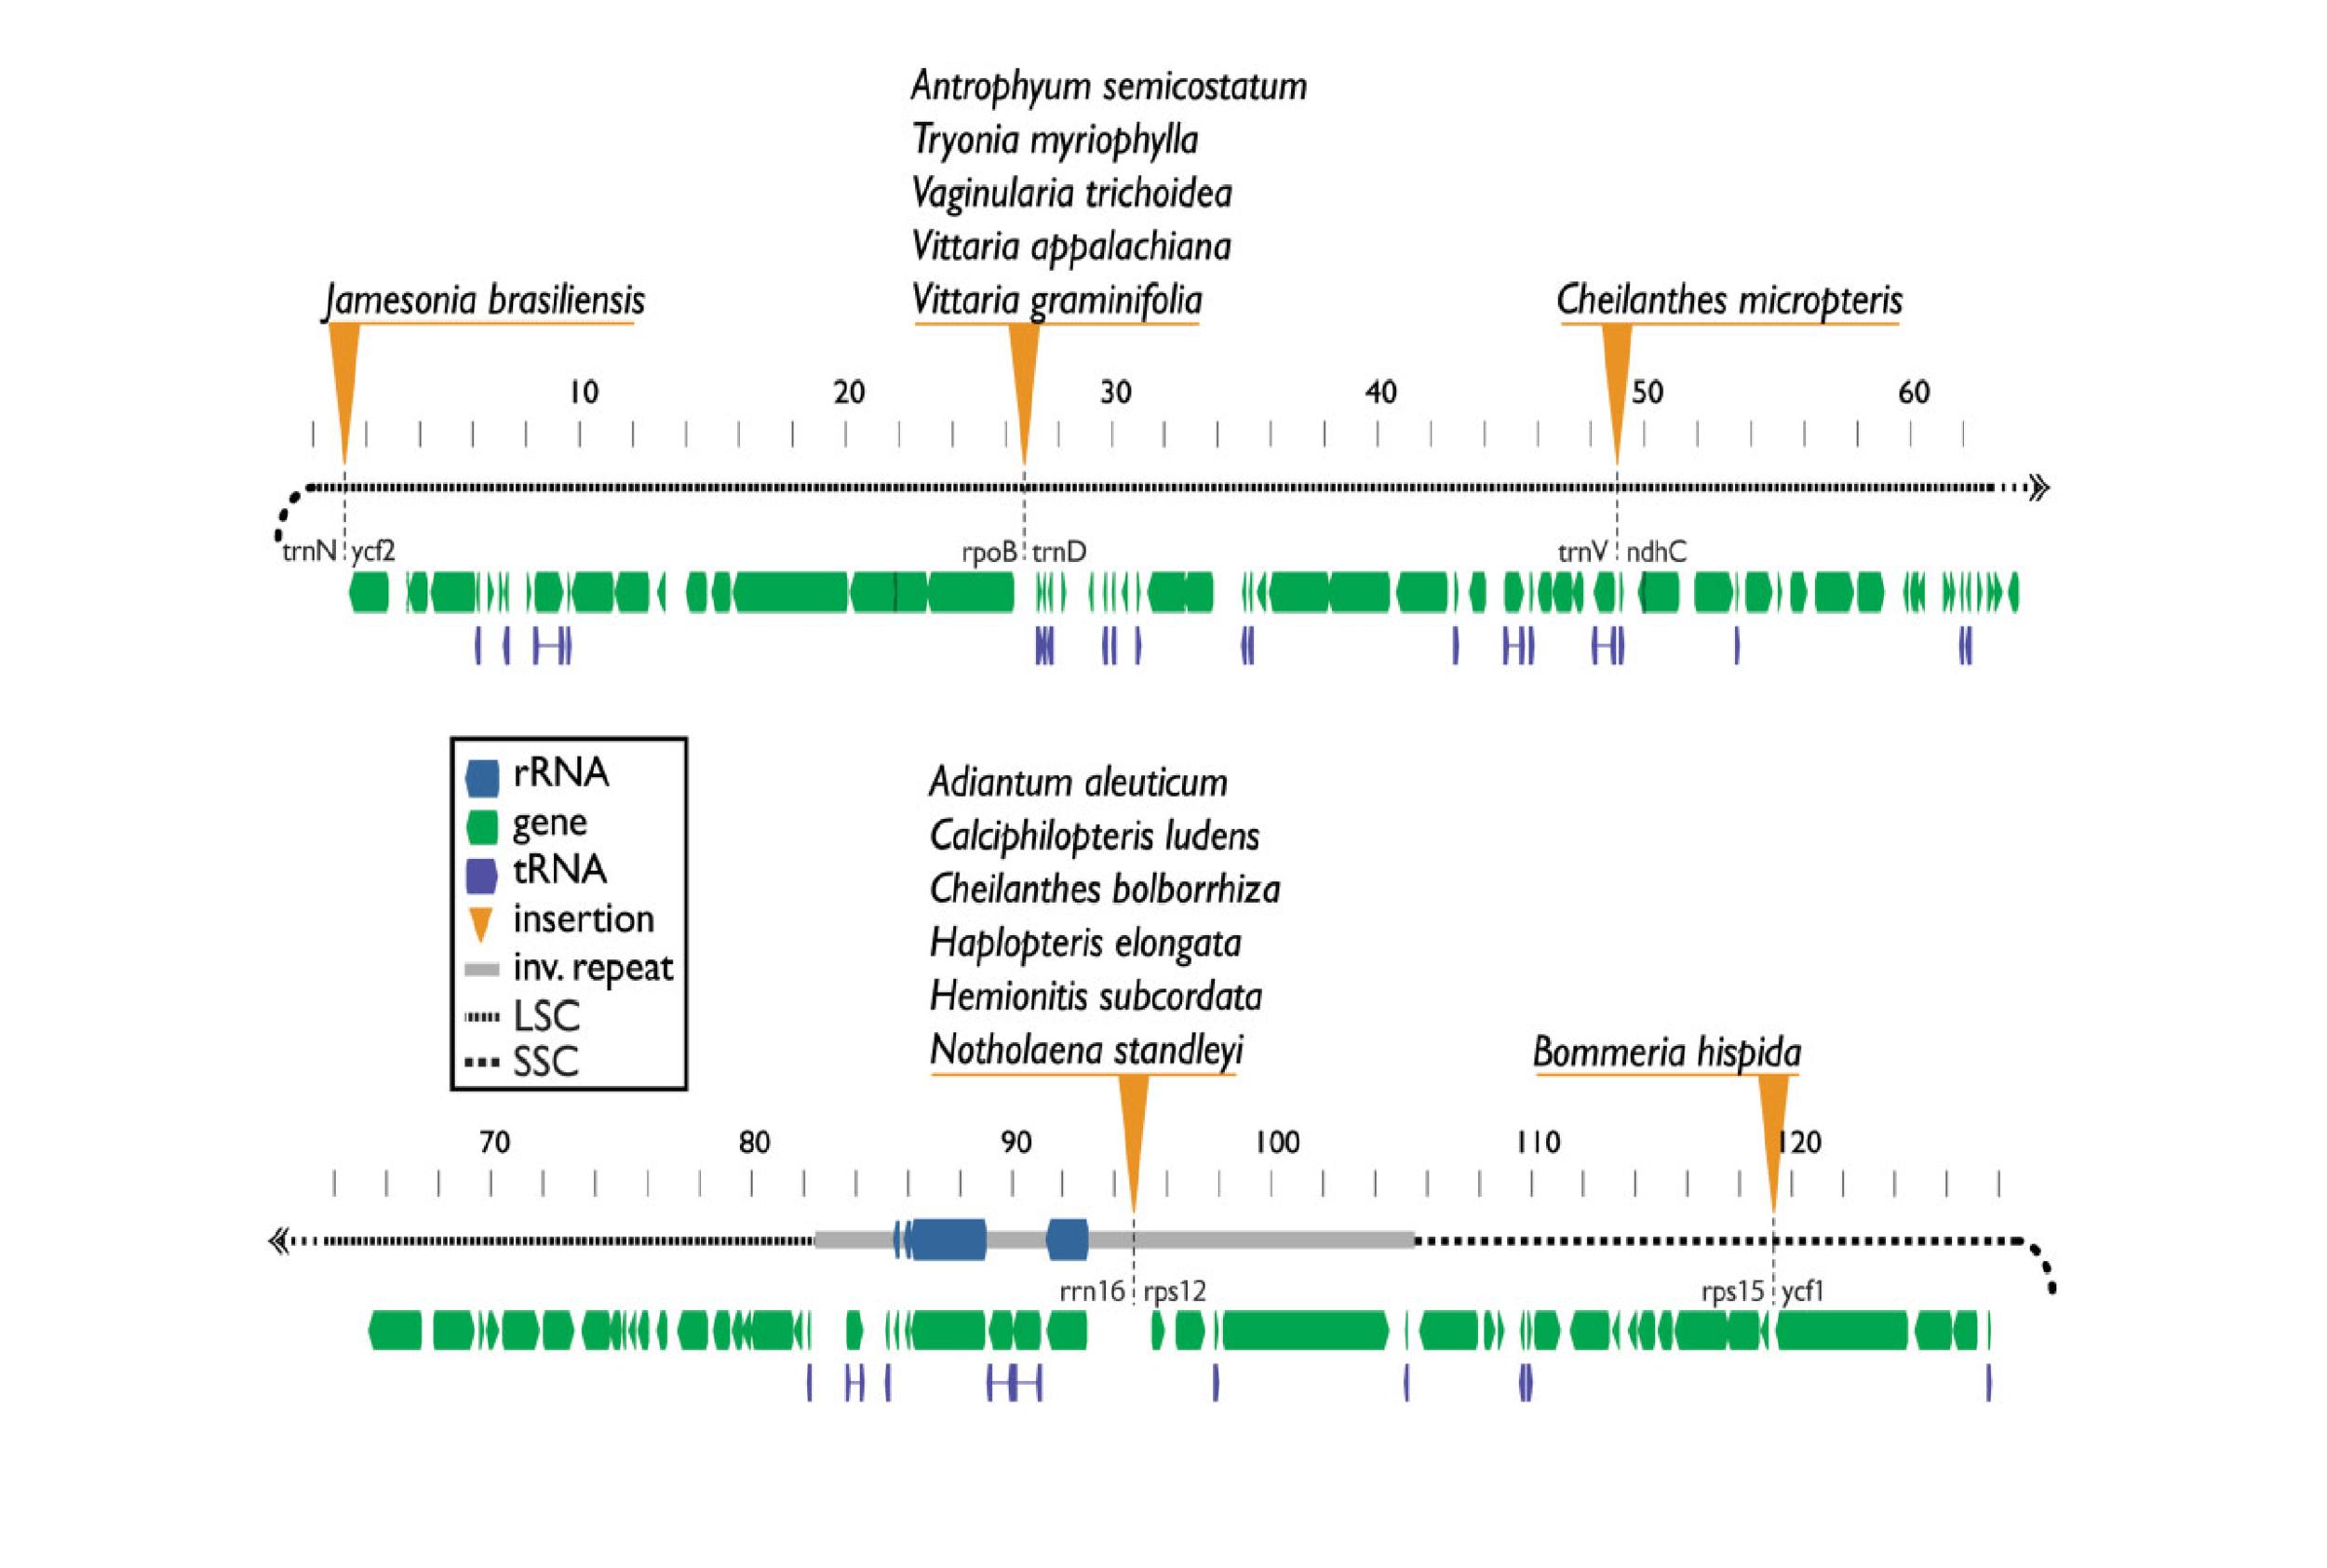 figure 2: Detected insertion sites in plastomes of Pteridaceae, relative to  Adiantum capillus-veneris .  Light gray bar denotes inverted repeat region. Robison et al. 2018  GBE.